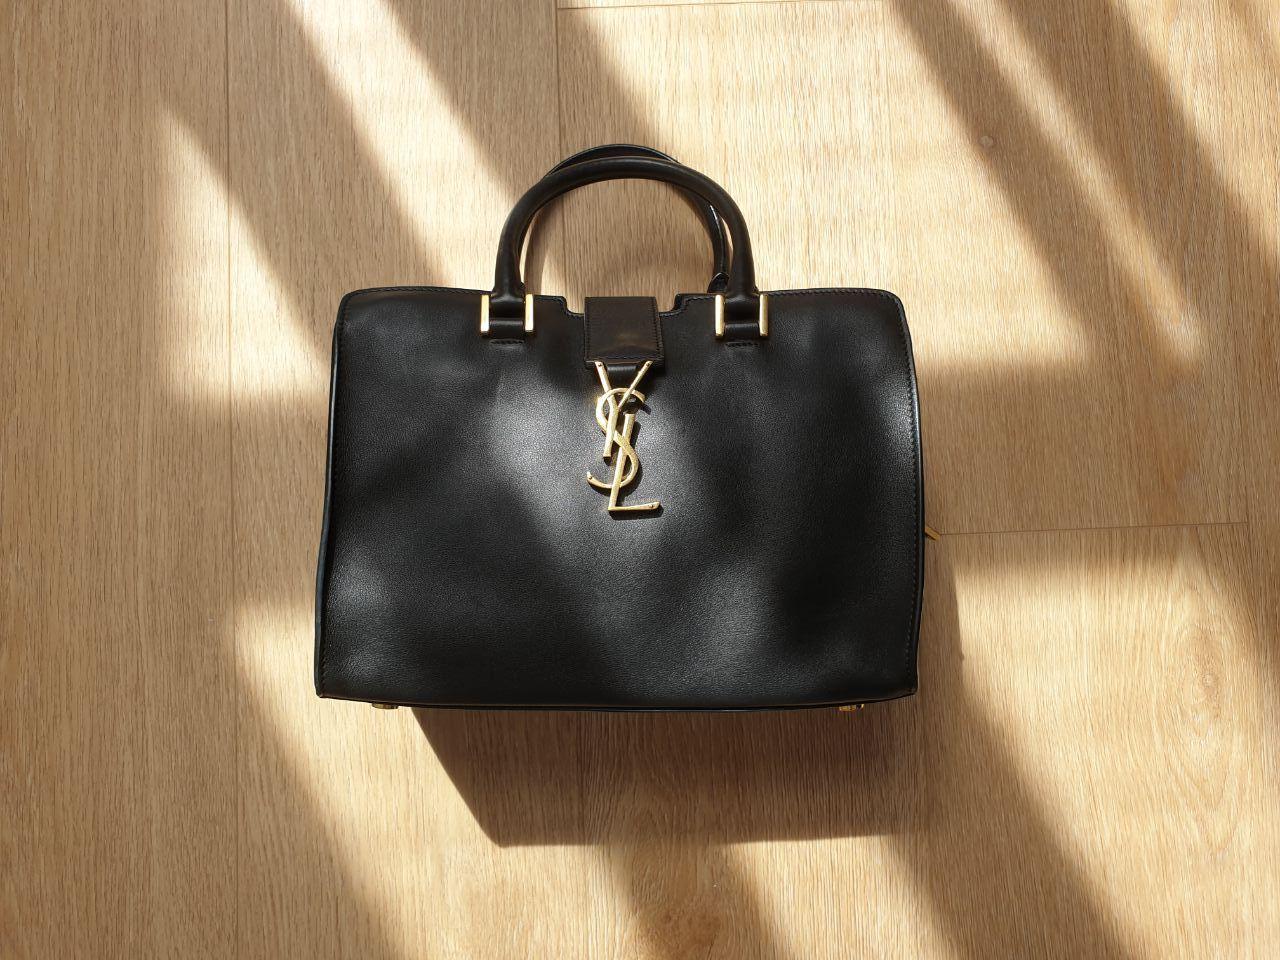 YSL Cabas small bag